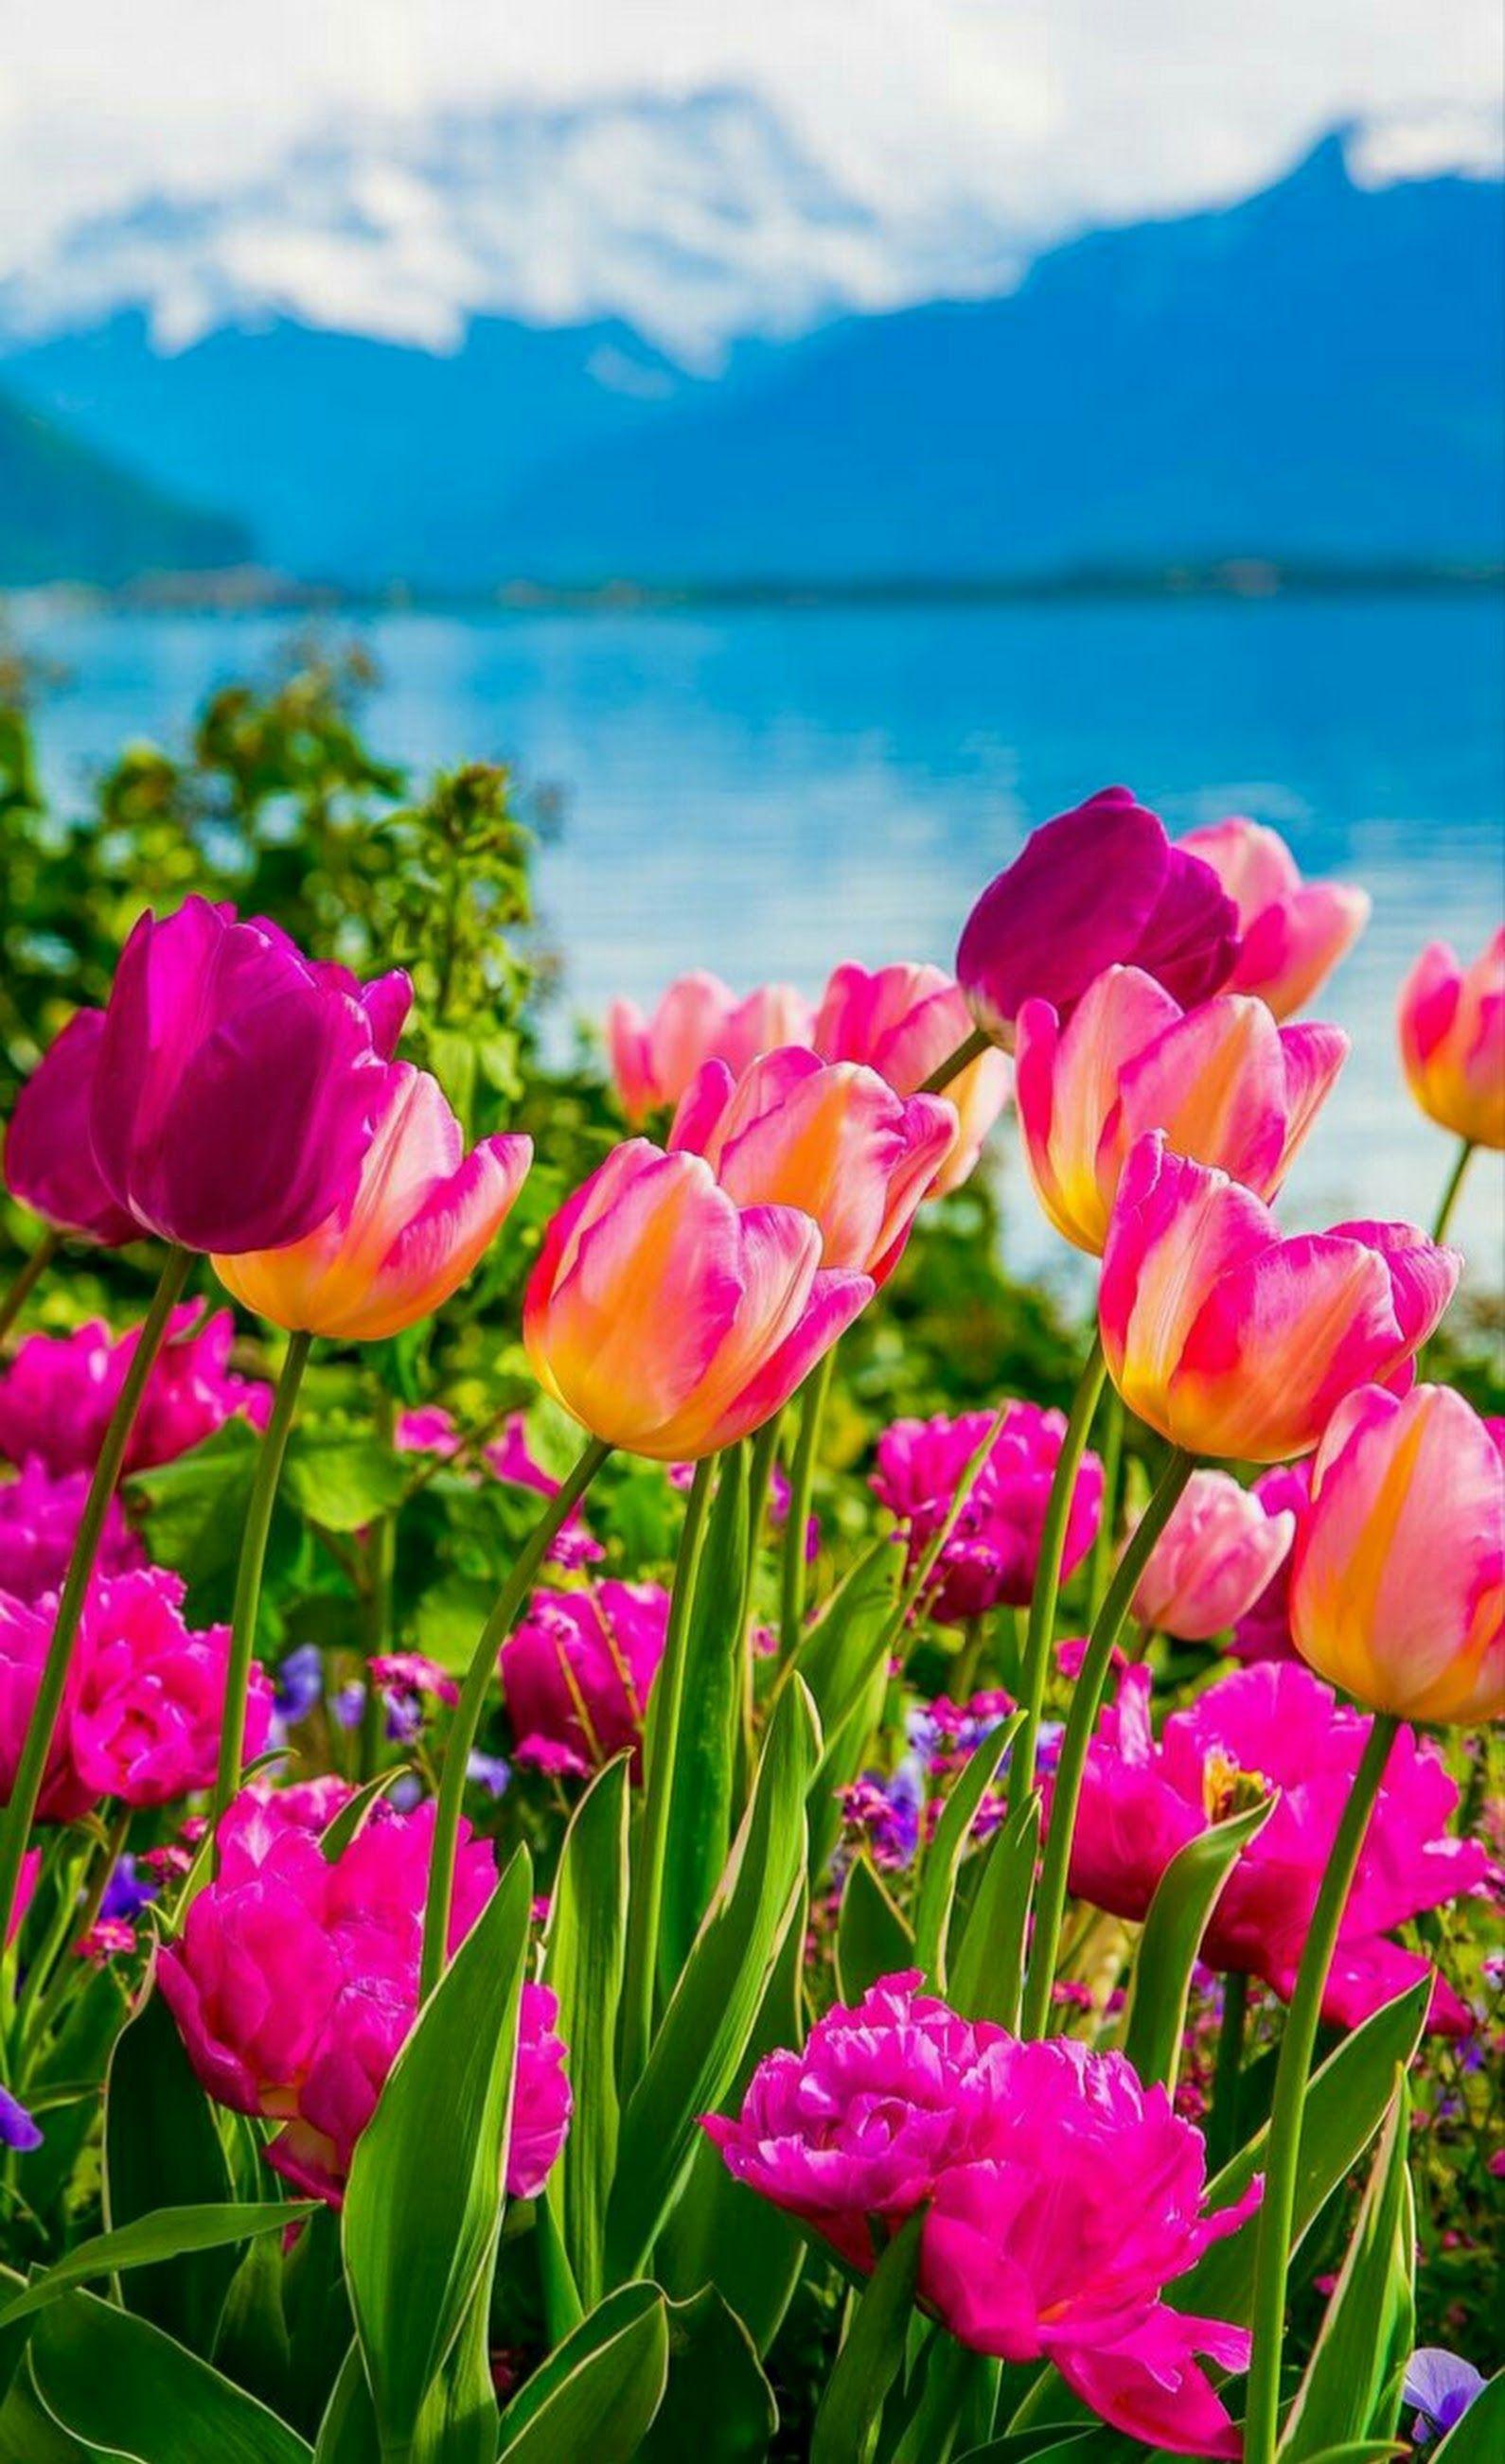 tulips near a lake an mountains Beautiful flowers, Most